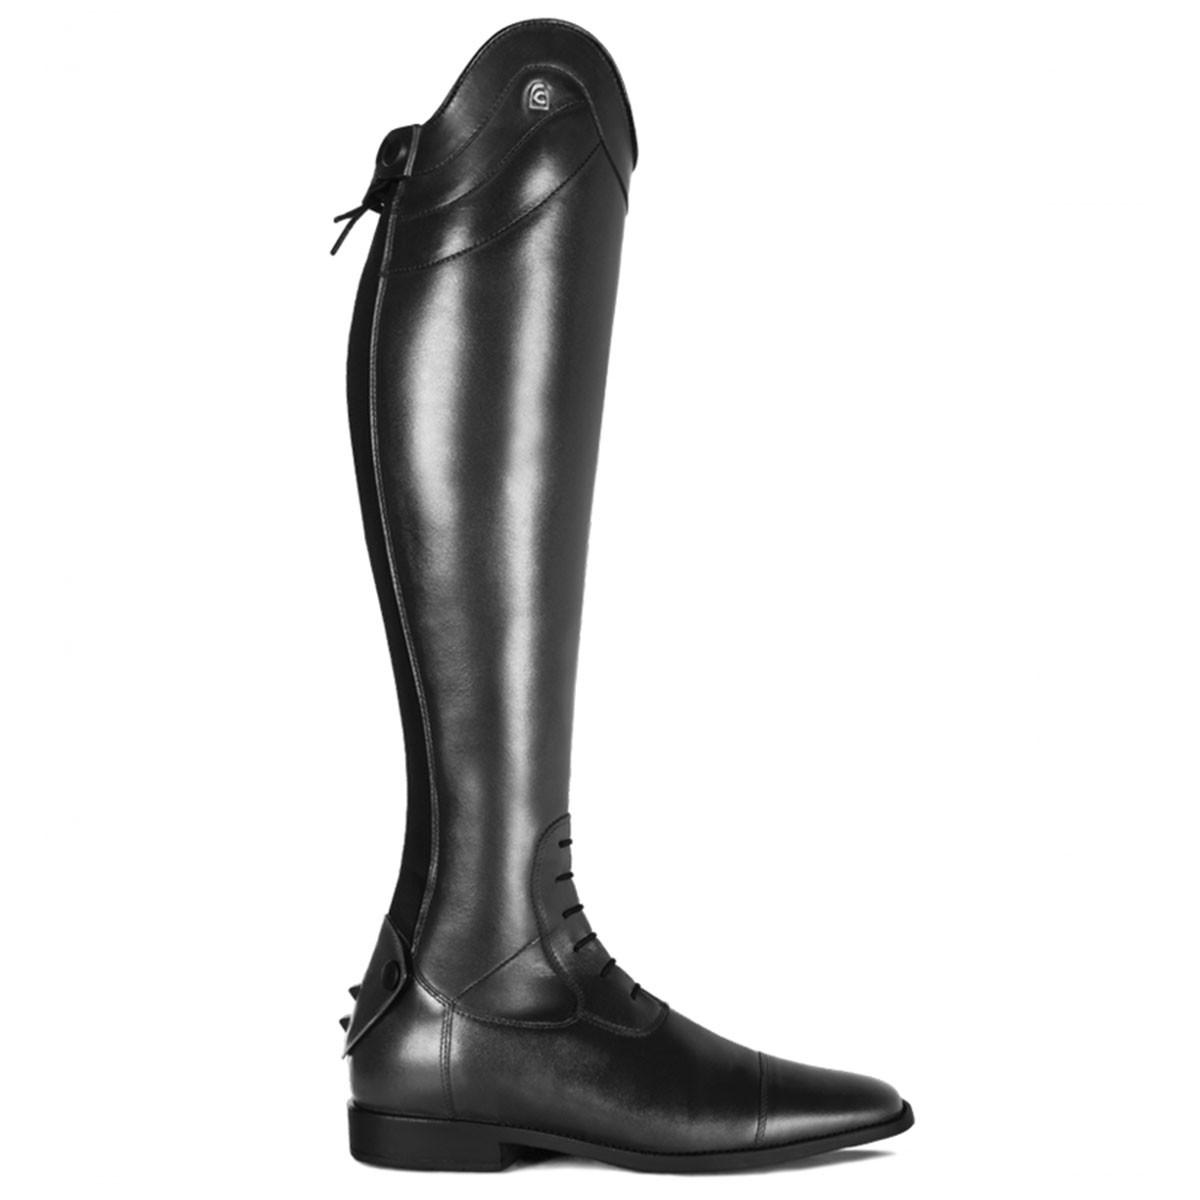 Cavallo Linus Slim rijlaars zwart maat:8-8.5 / h51-w37